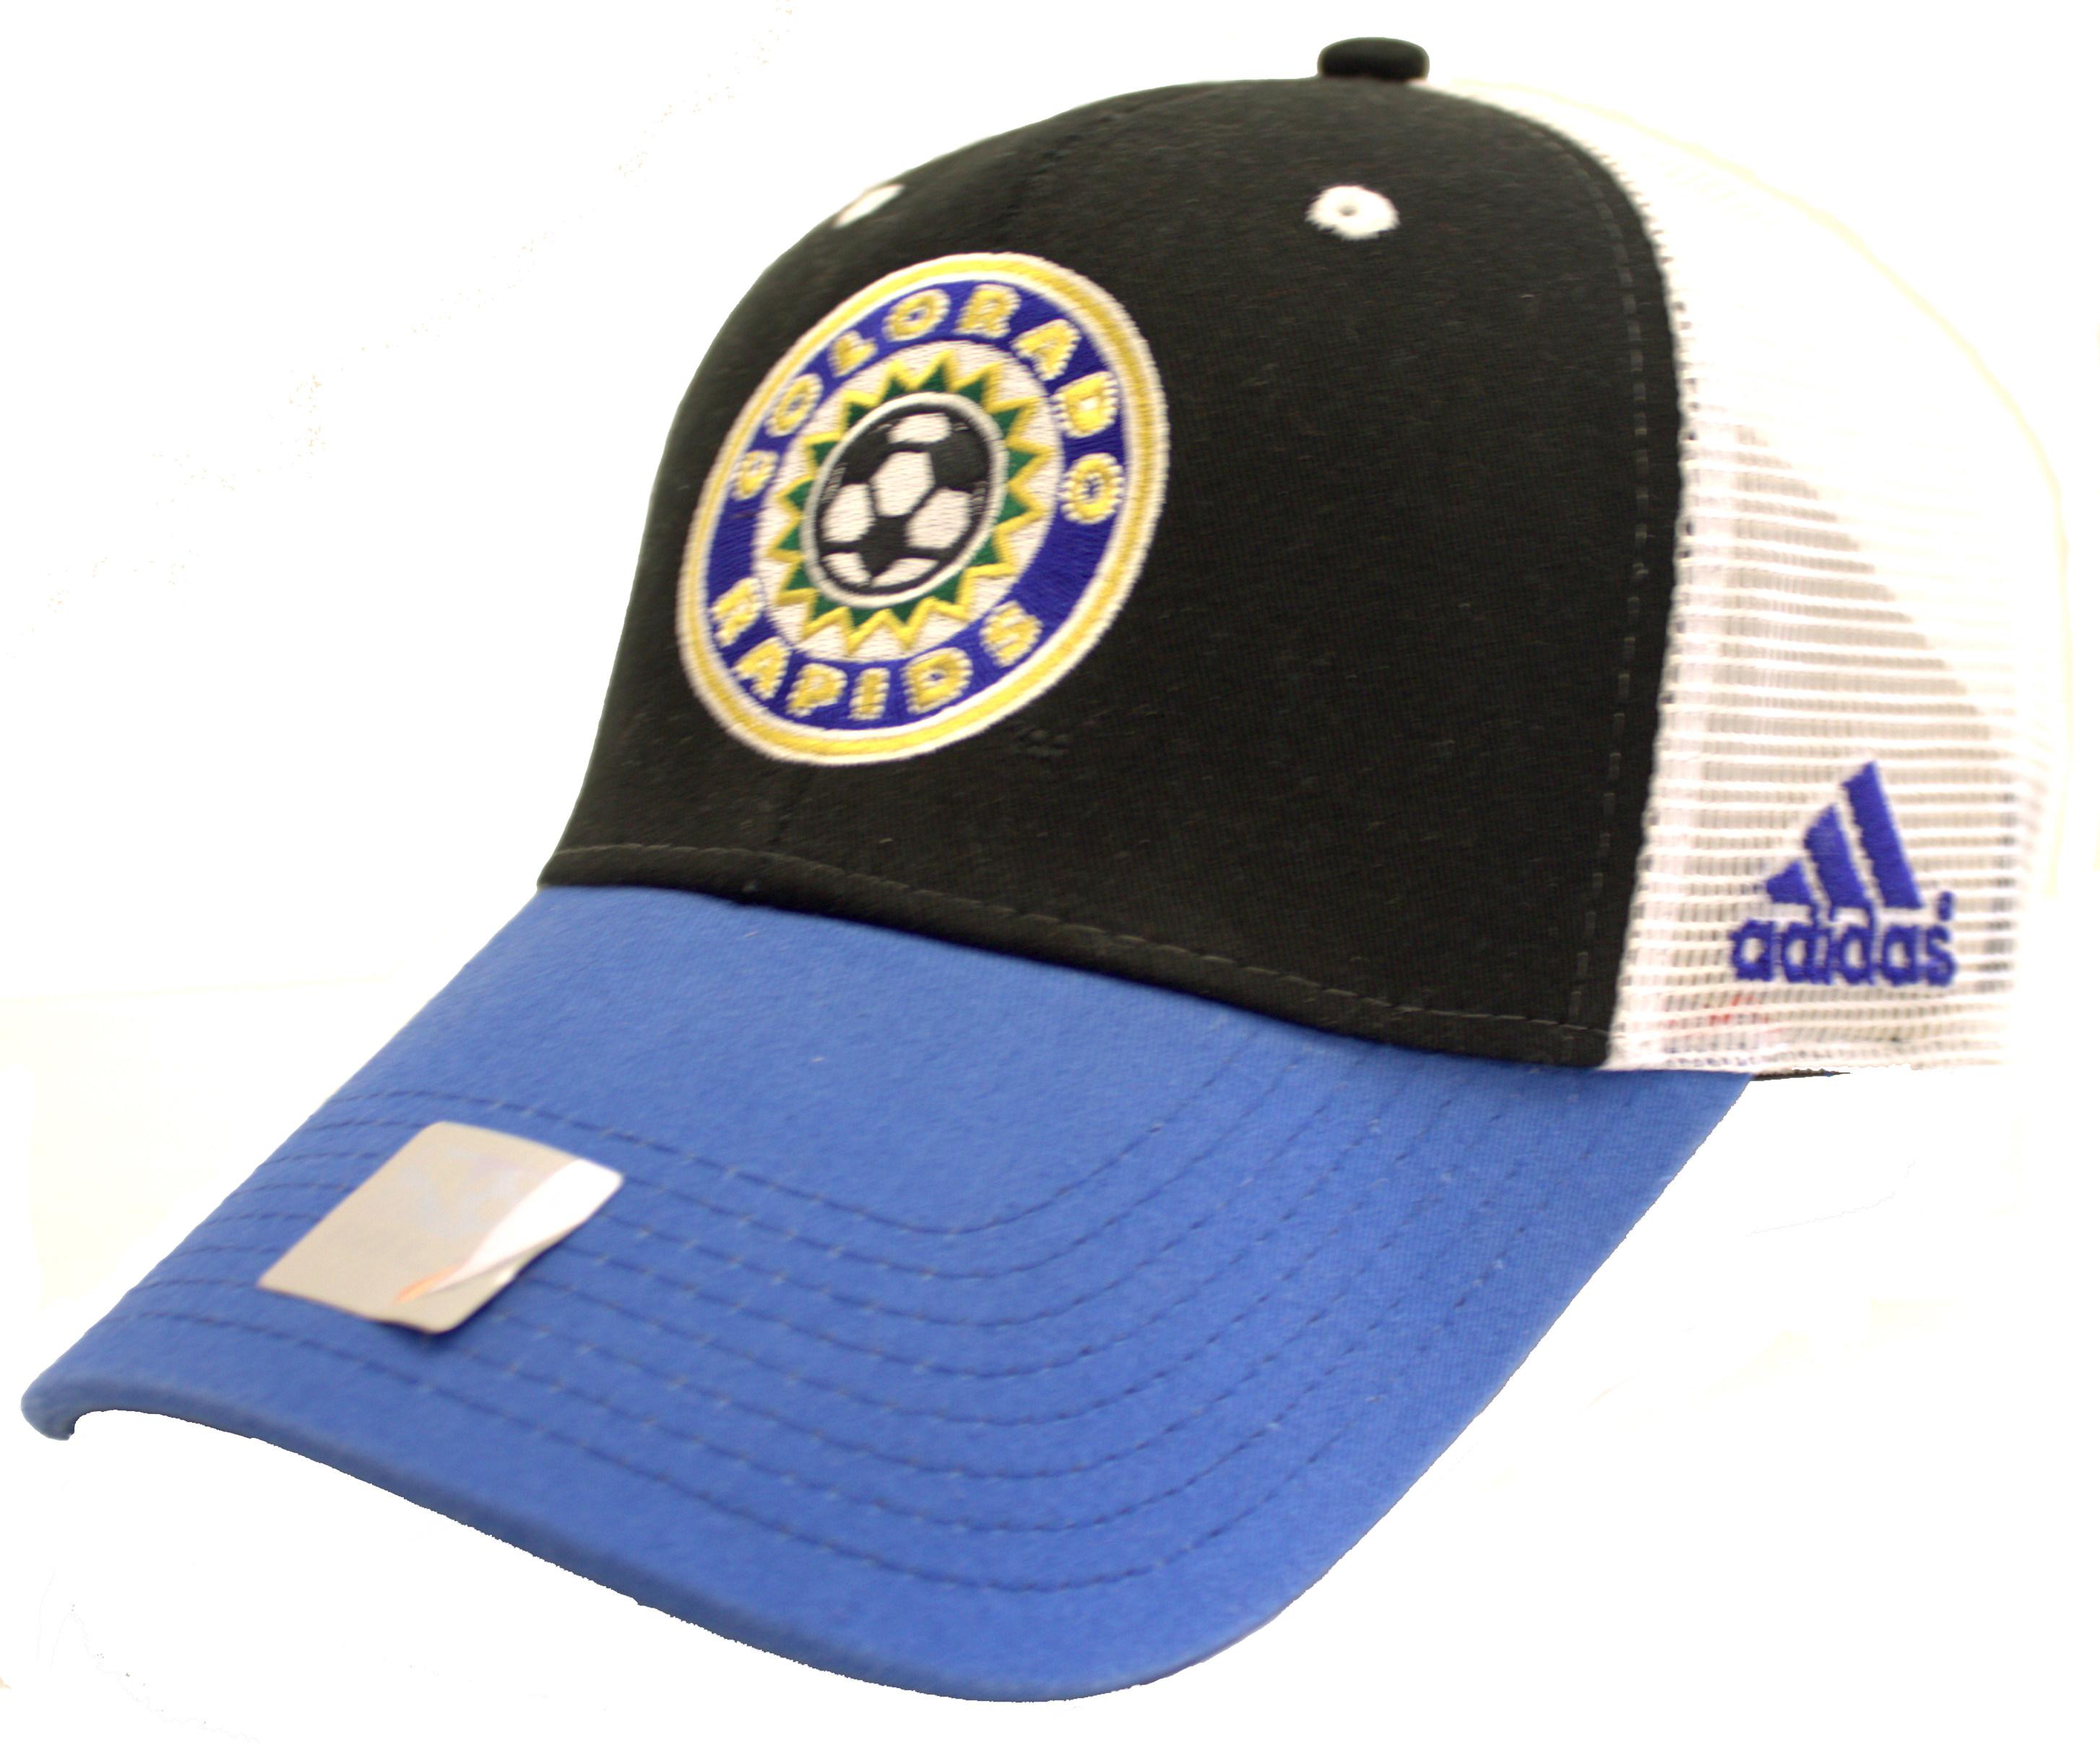 low price sale in stock recognized brands Colorado Rapids Player Mesh Adjustable Hat | eBay